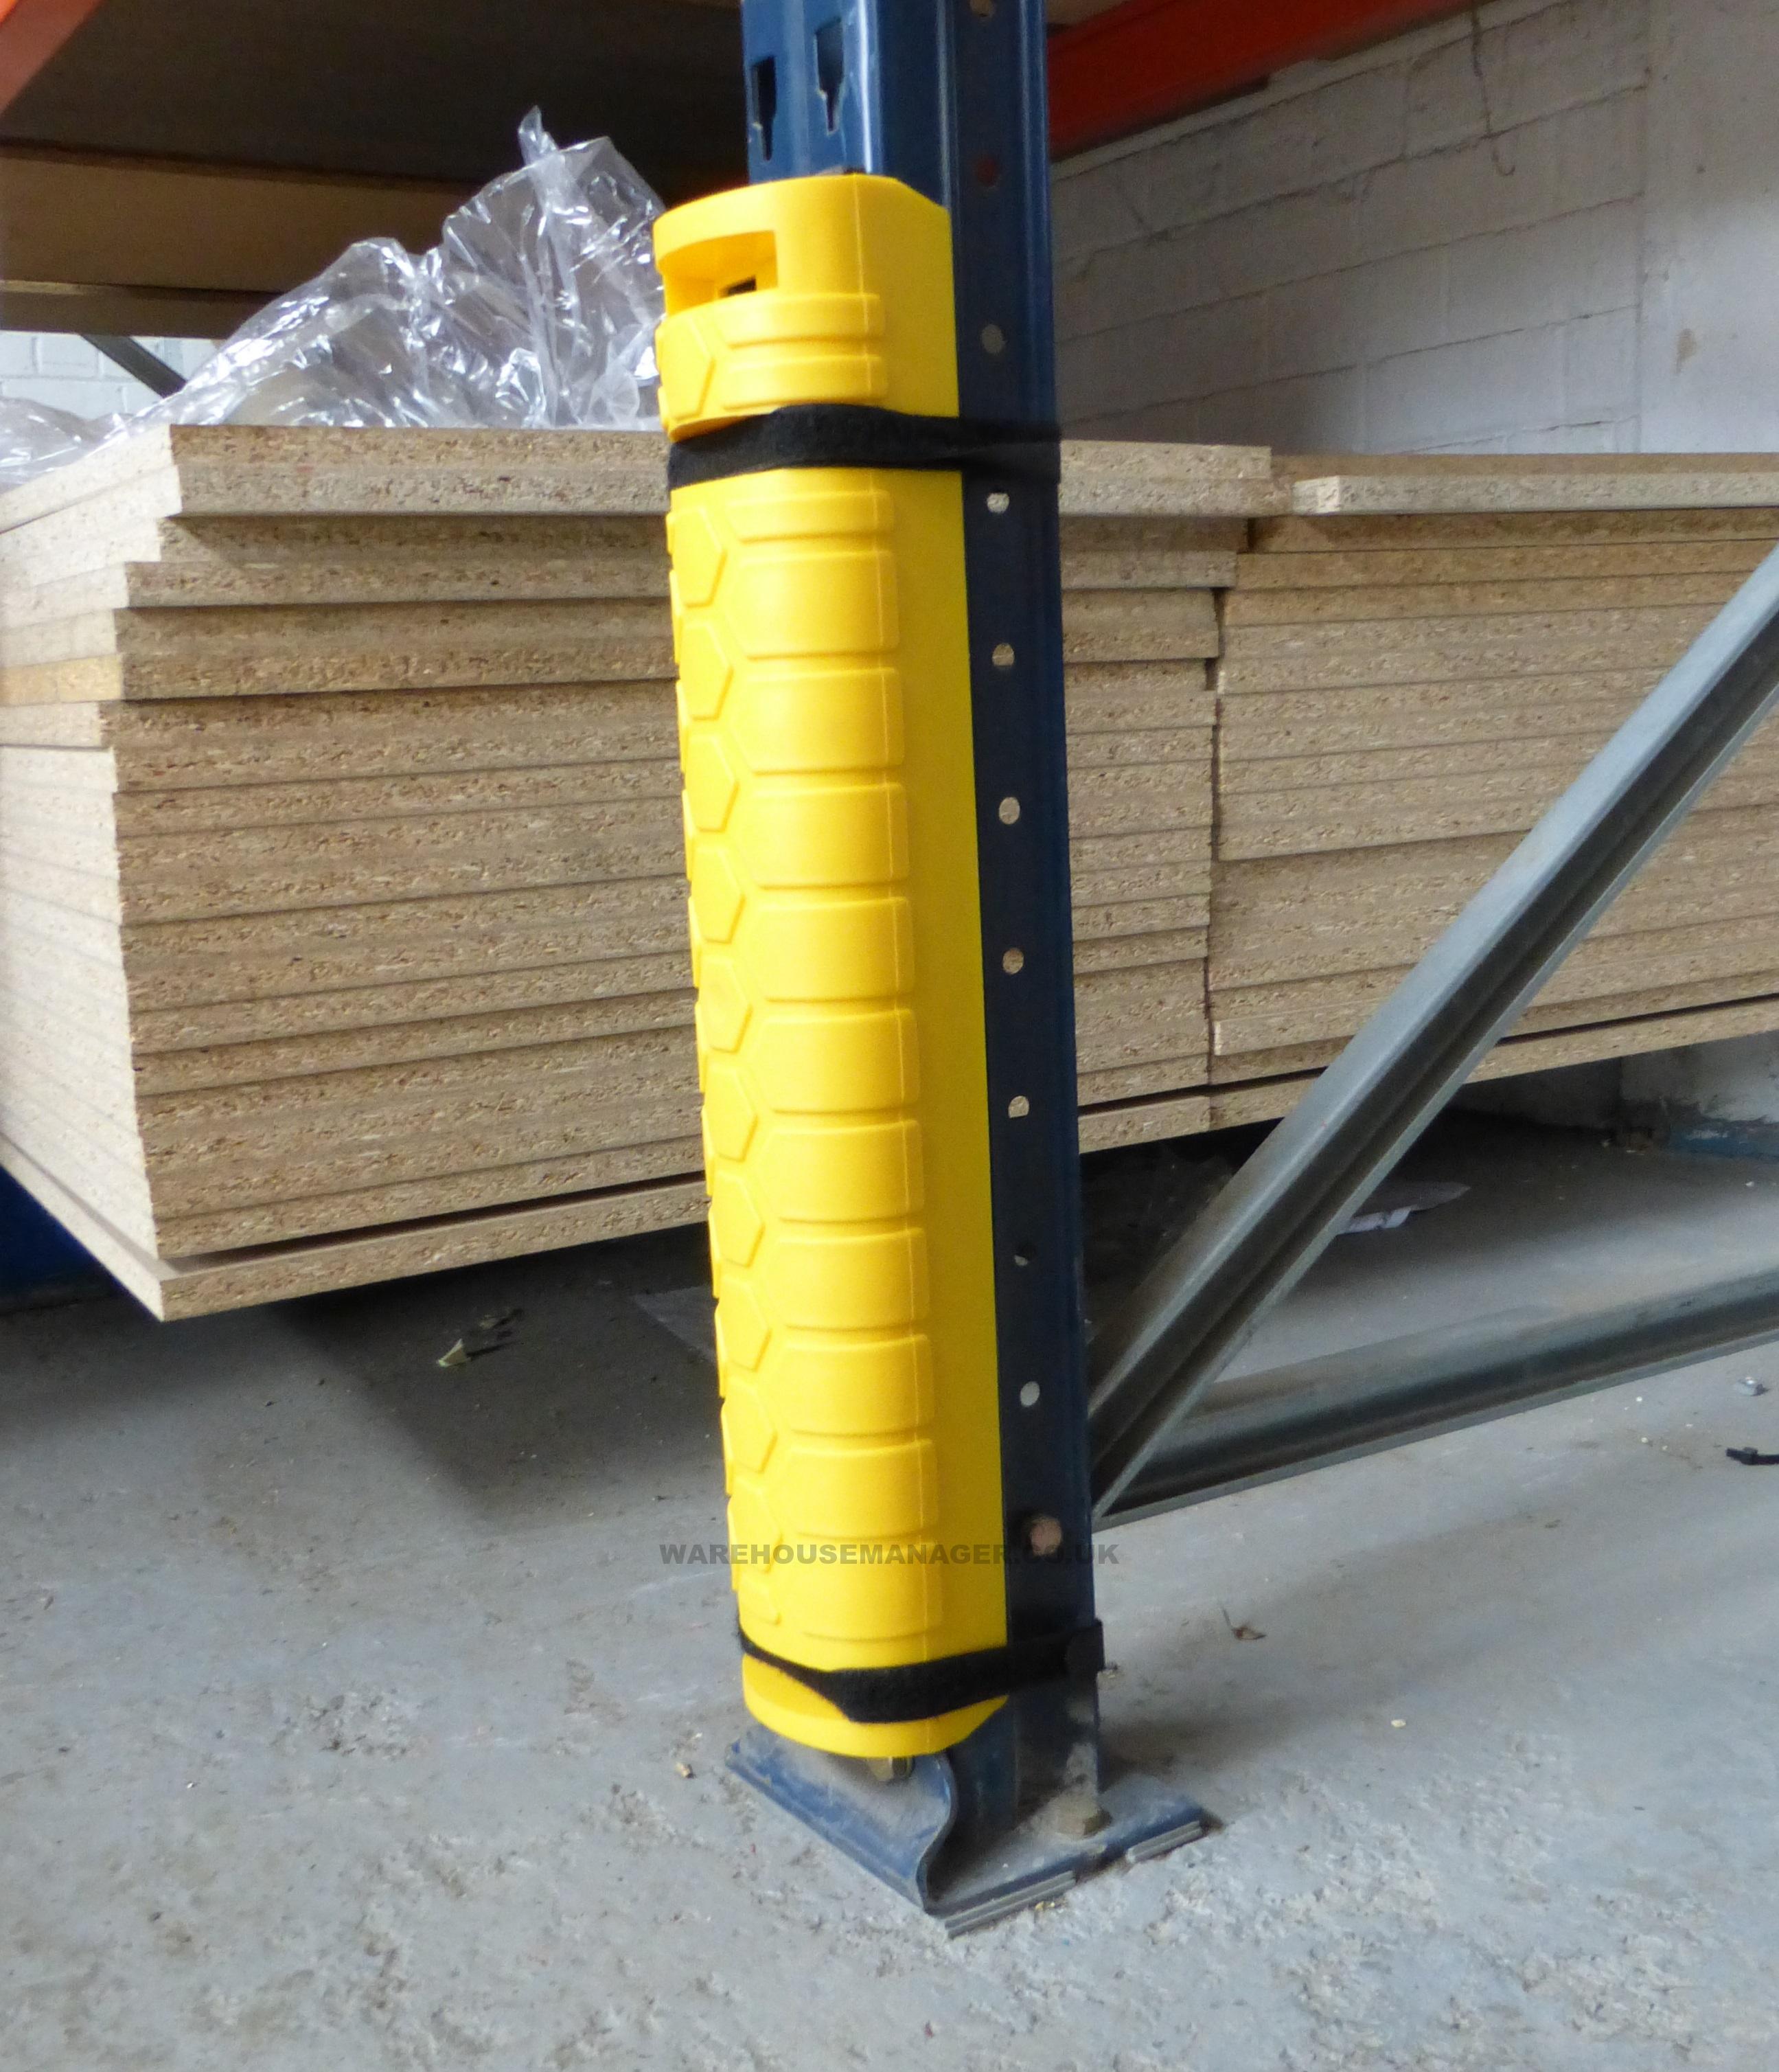 NEW – Plastic Pallet Racking Protectors – Column Guards – PRP004